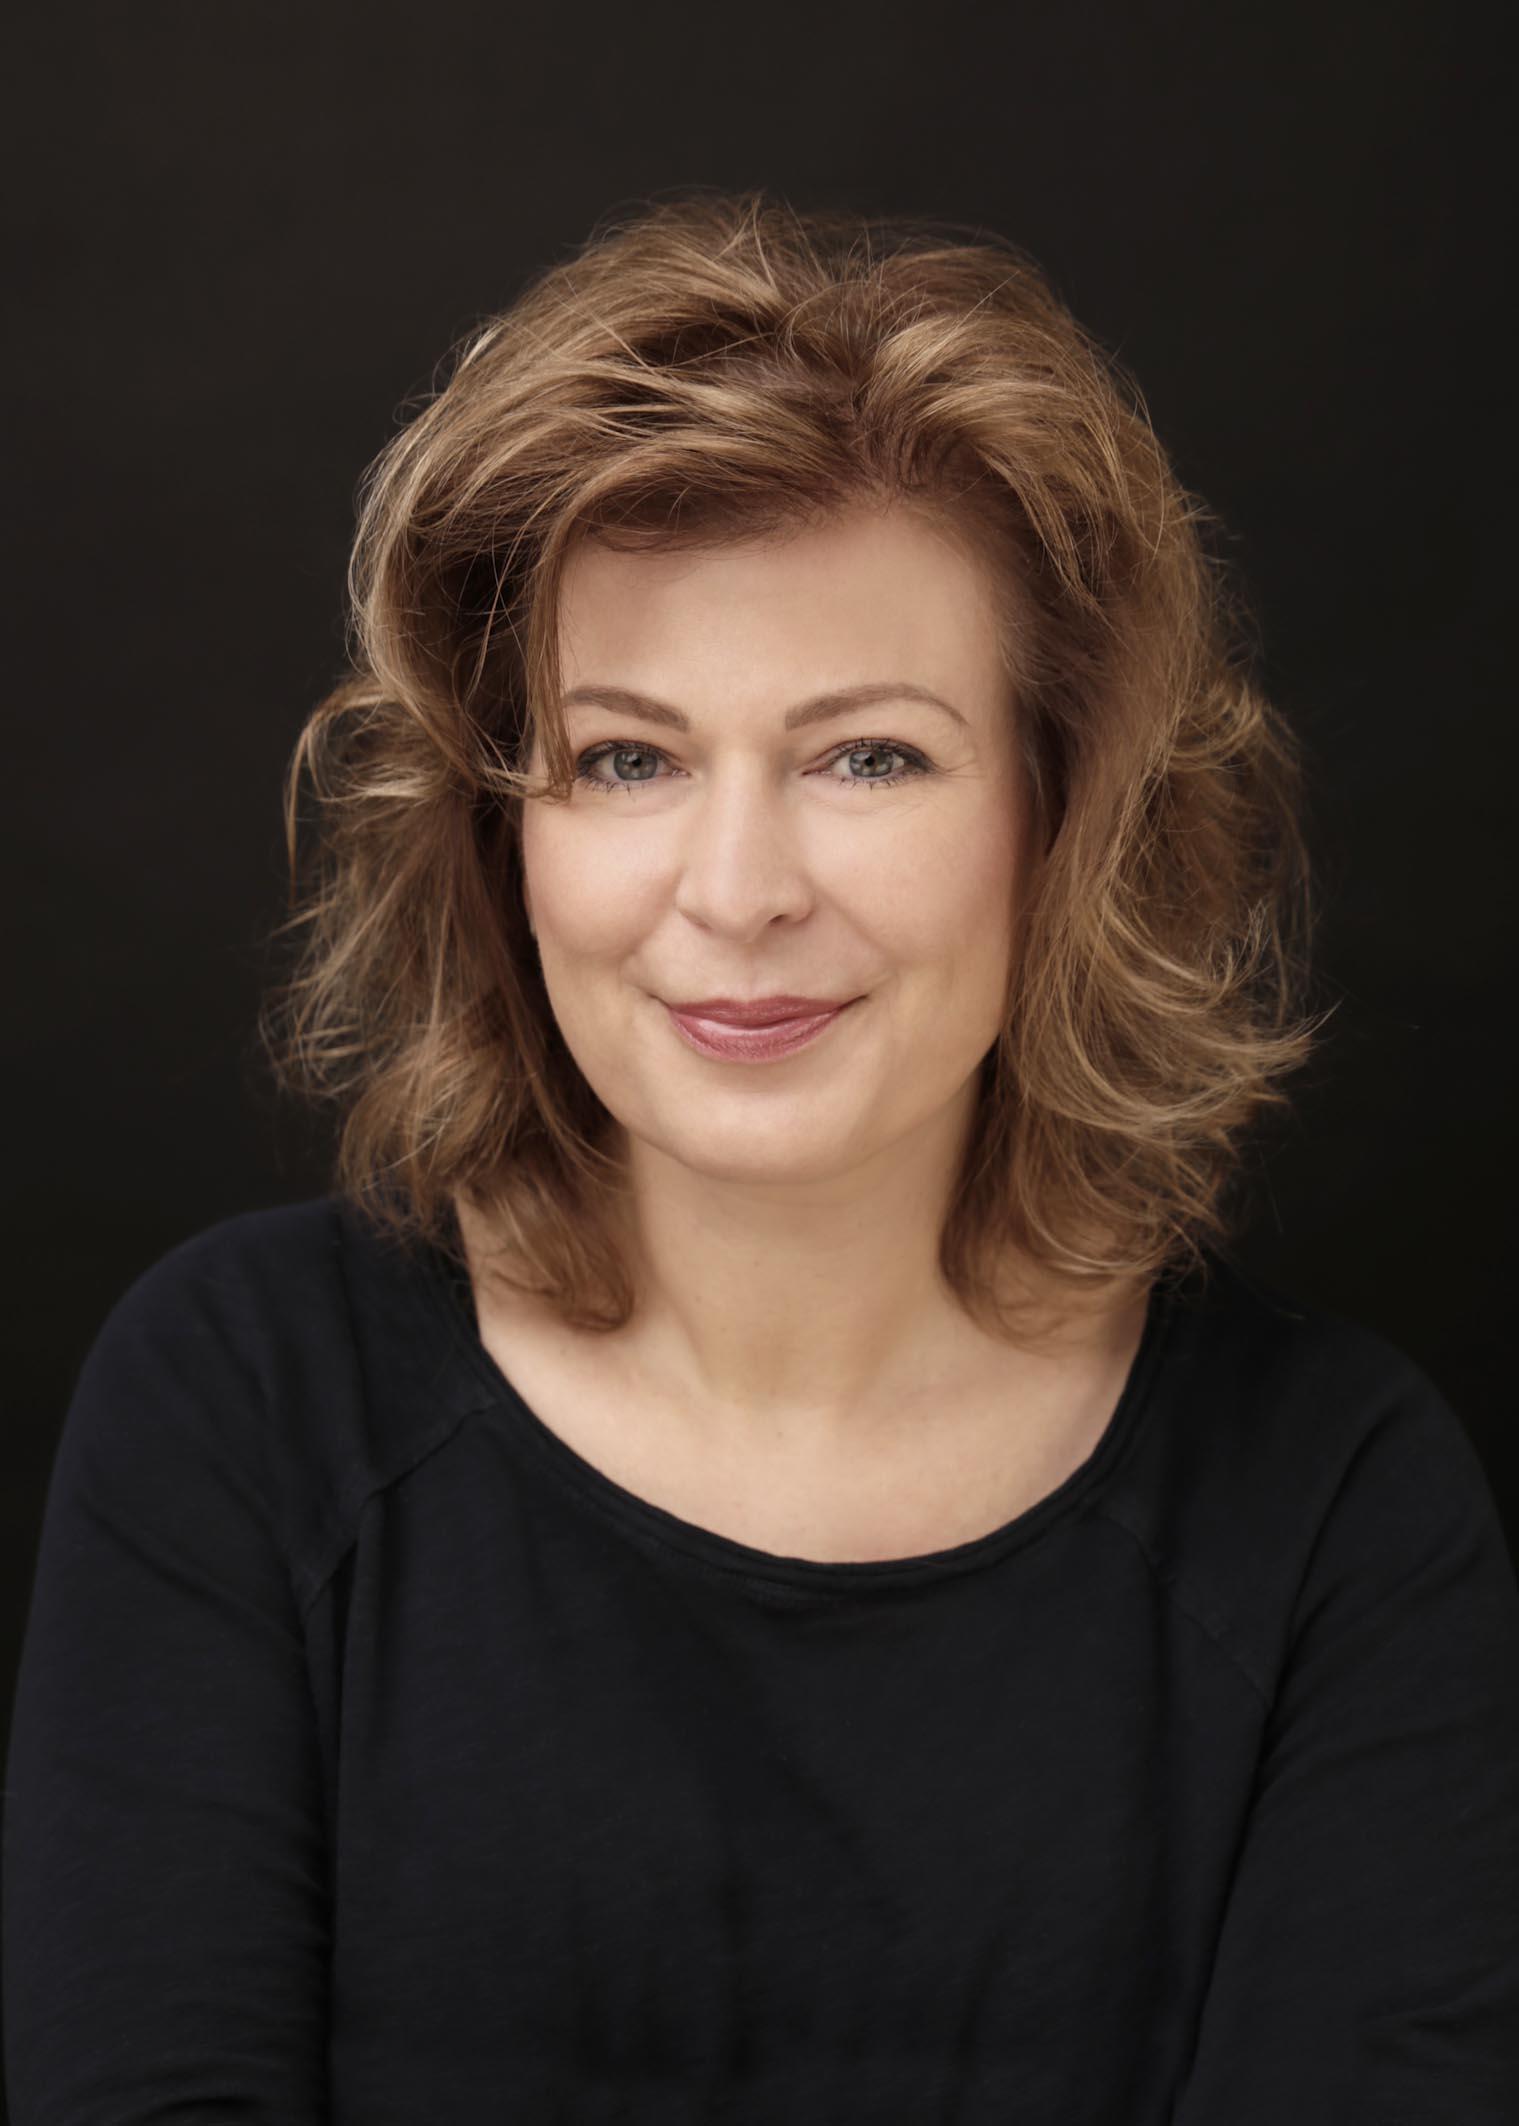 Astrid Christina Zeppenfeld